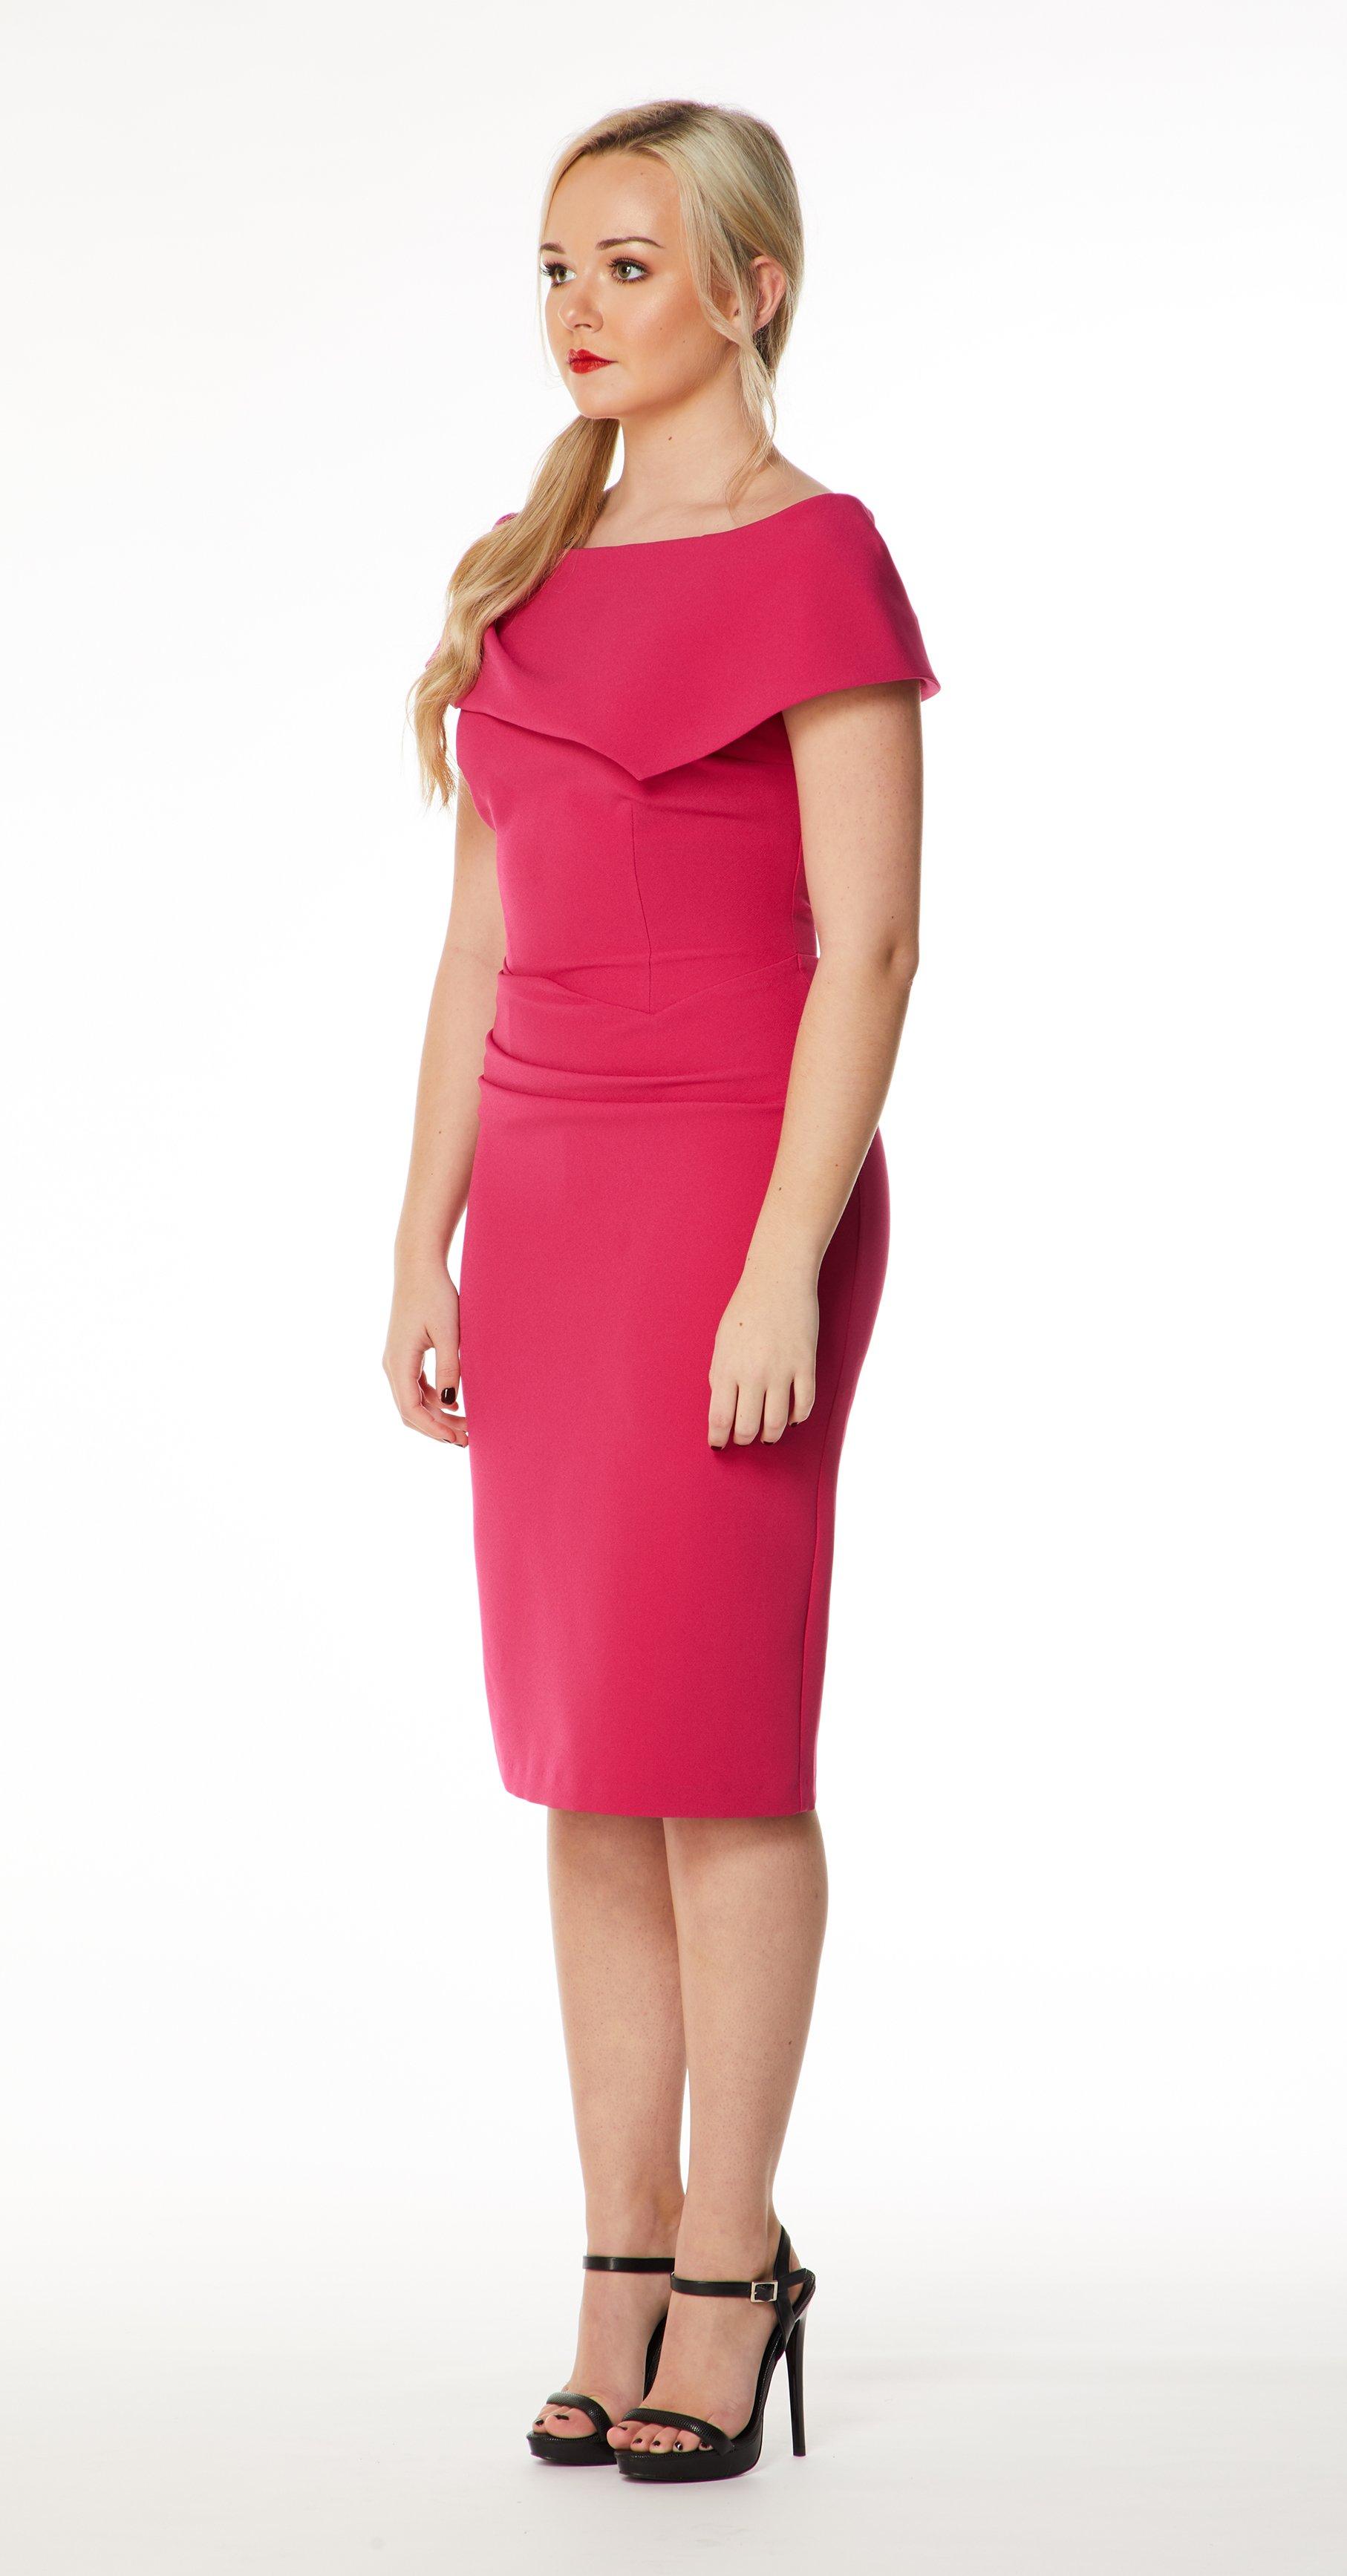 Mellaris   Olympia Dress - Pink